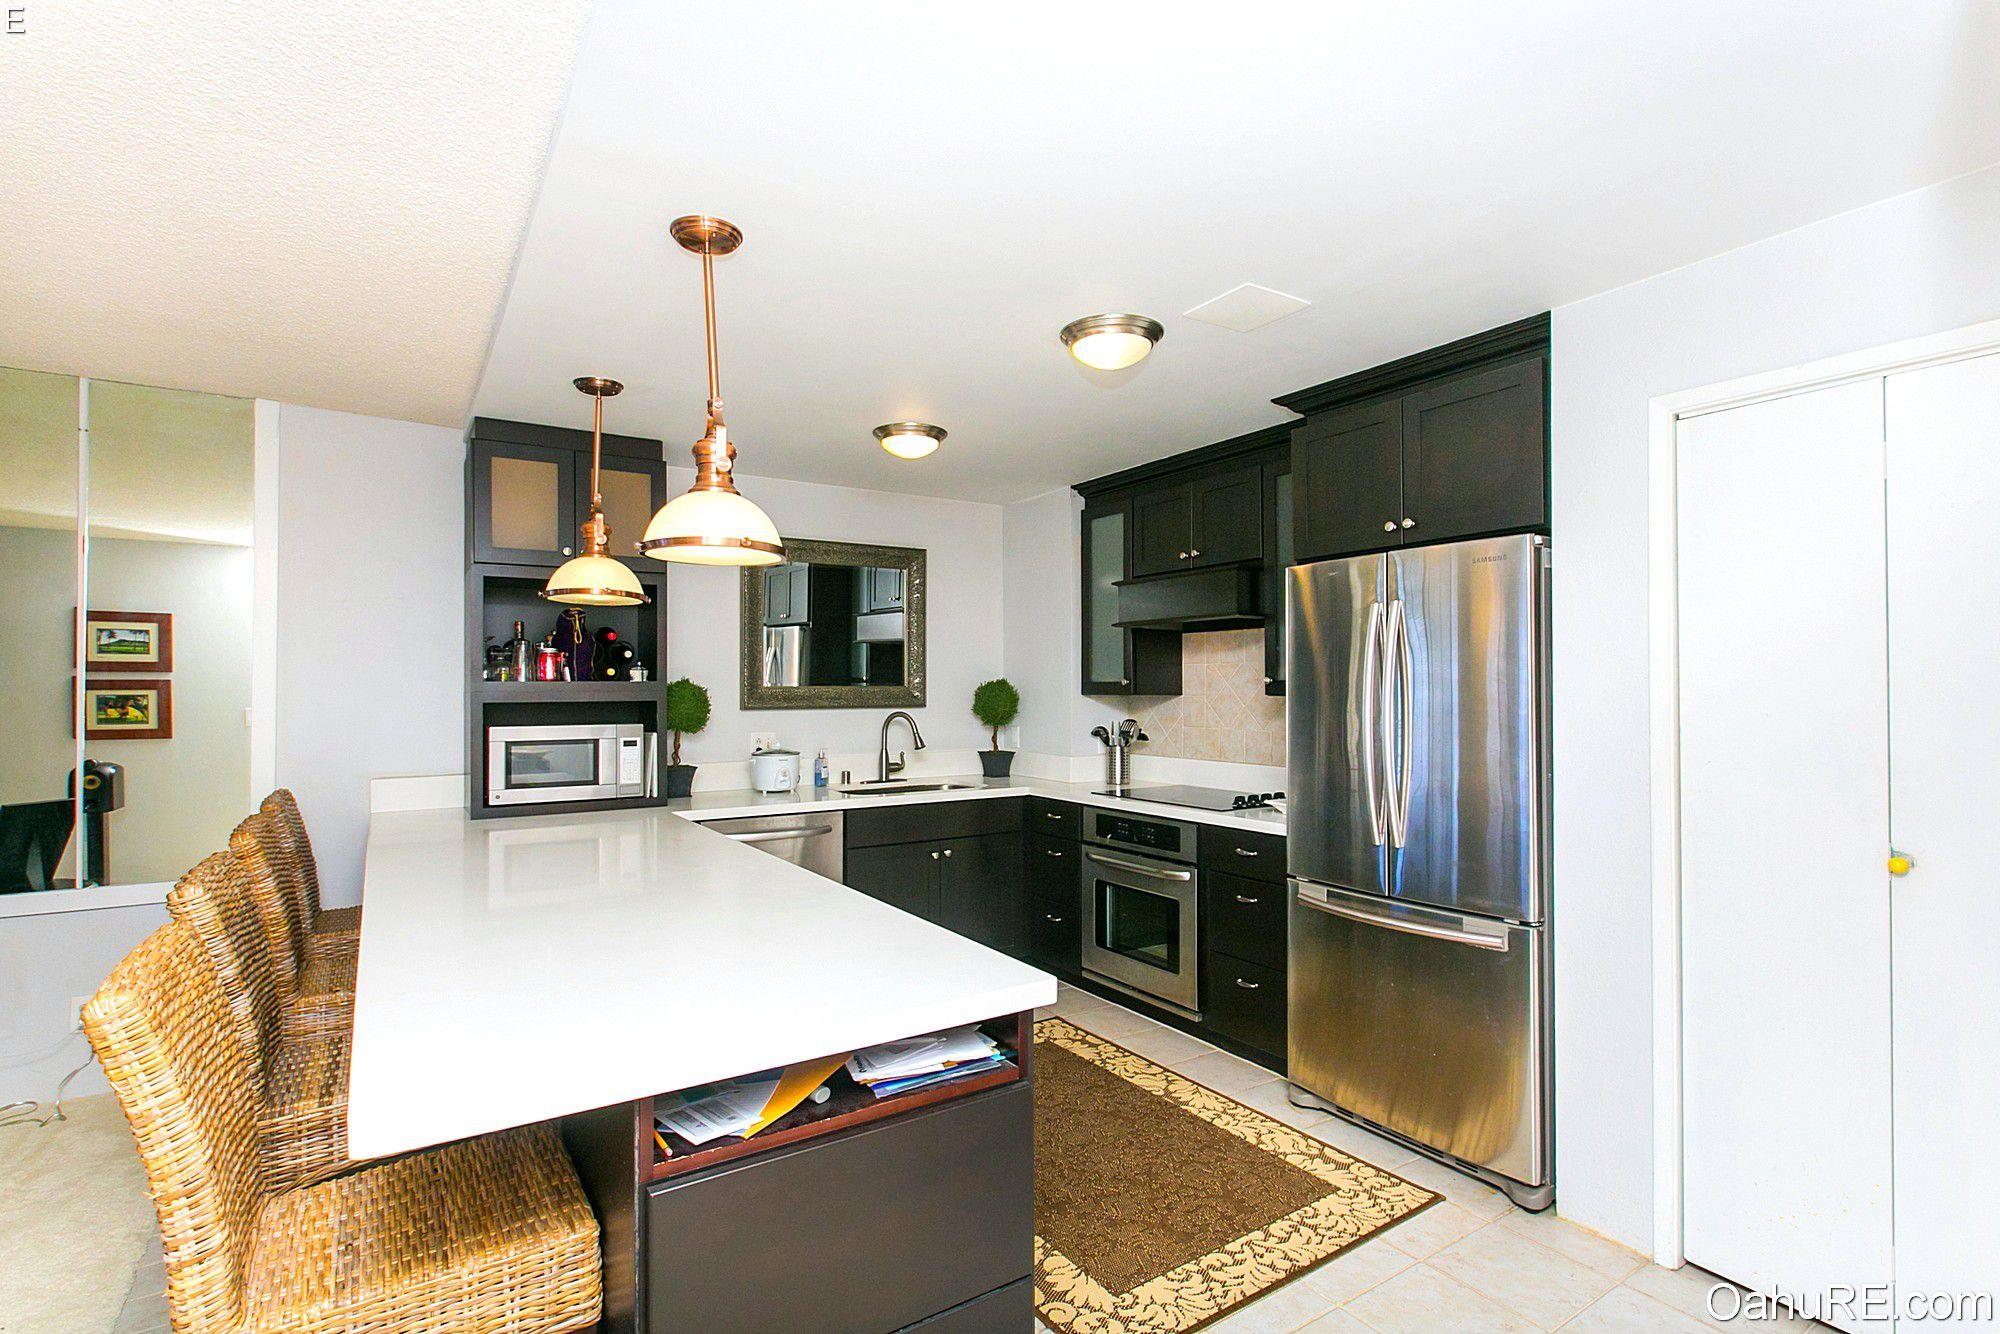 1255 Nuuanu Ave #1701, Honolulu, HI 96817 - Estimate and Home ...